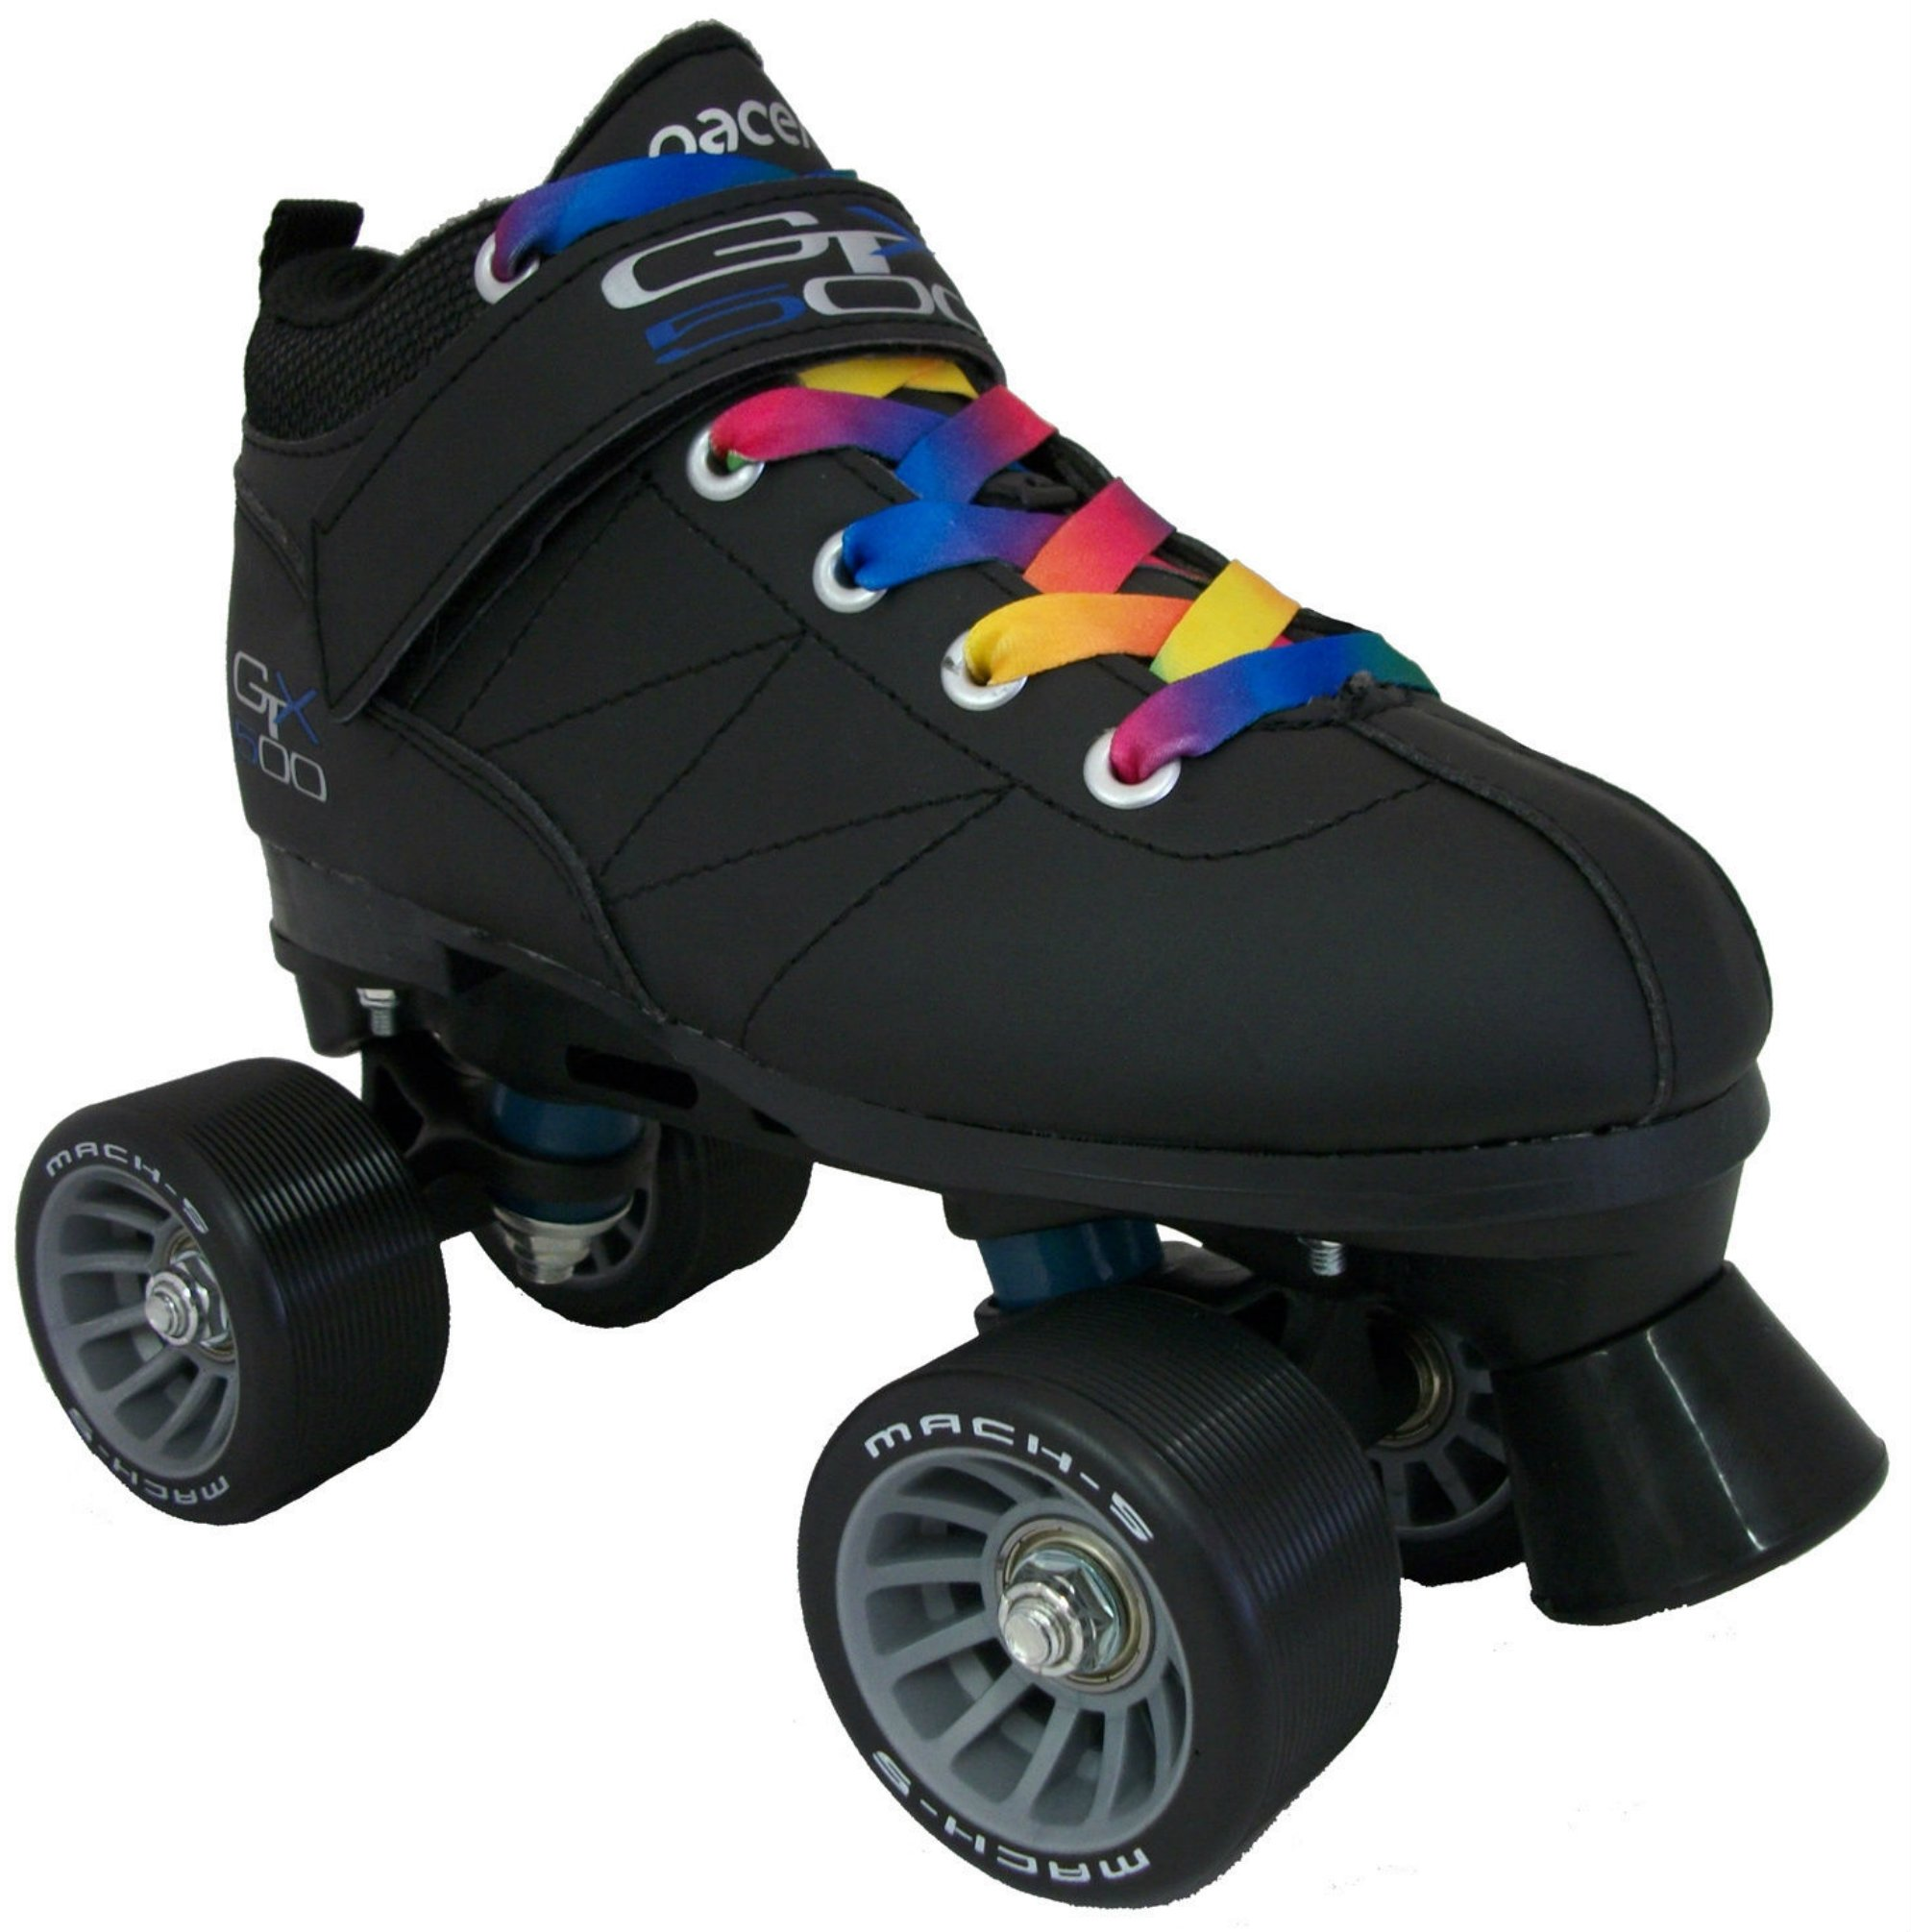 Black Pacer Mach-5 GTX500 Quad Speed Roller Skates w/ 2 Pair of Laces Rainbow & Black